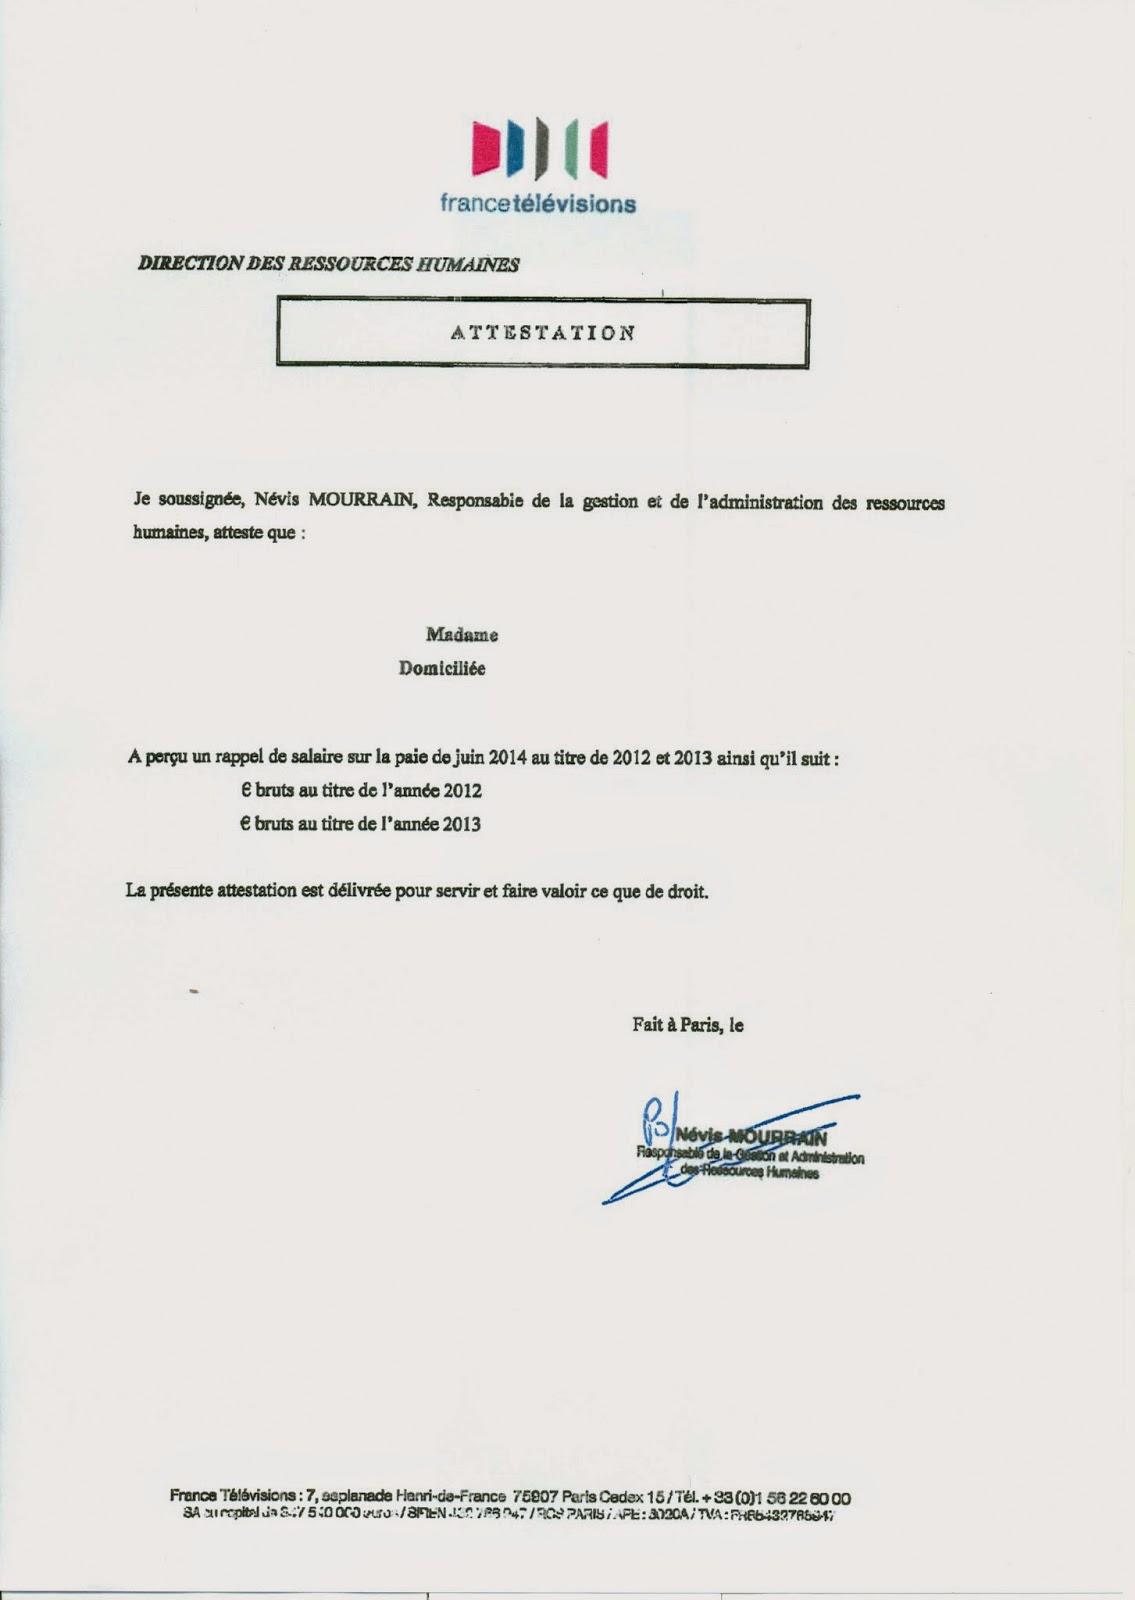 Modele Attestation Employeur Net Fiscal Document Online